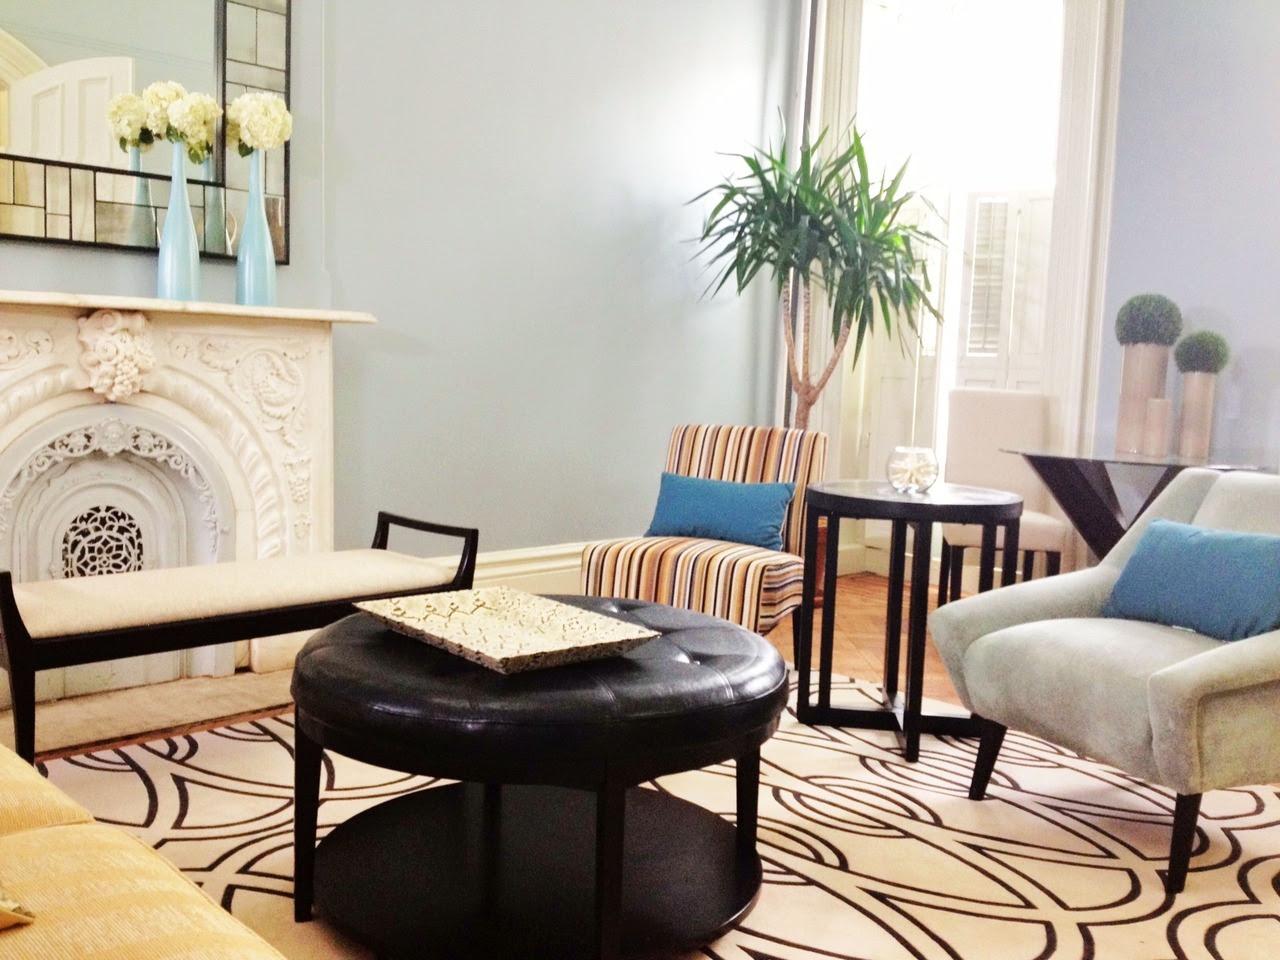 Apartment Room Ideas Tumblr